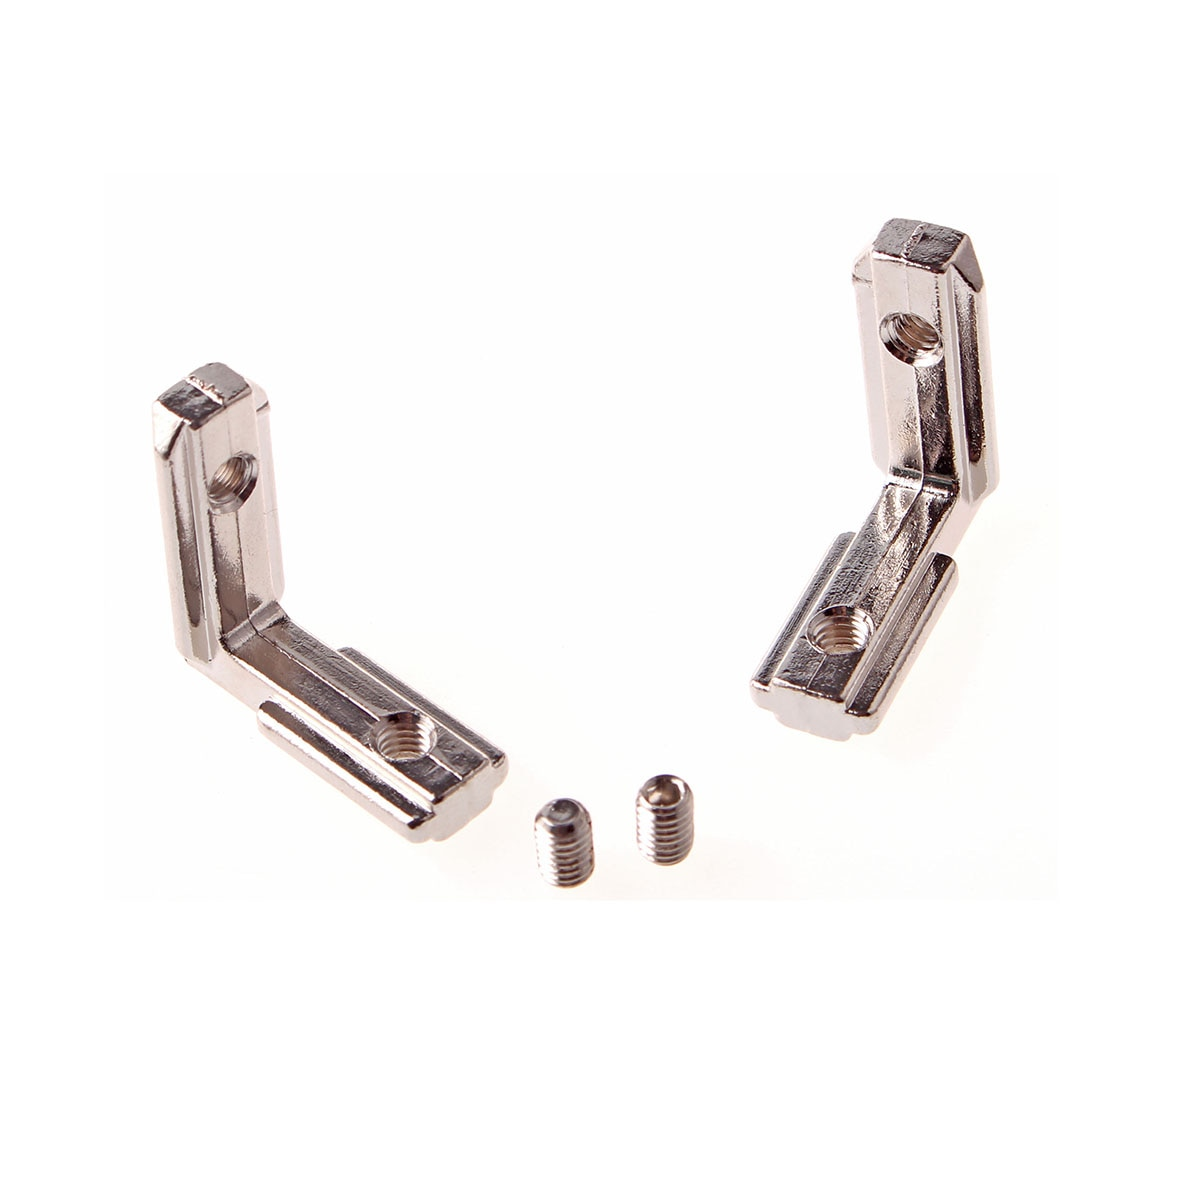 20 Series T Slot L Type 2020 Aluminum Profile Interior Inner Corner Connector Joint Bracket 90 Degree EU Standard with M4 Screws